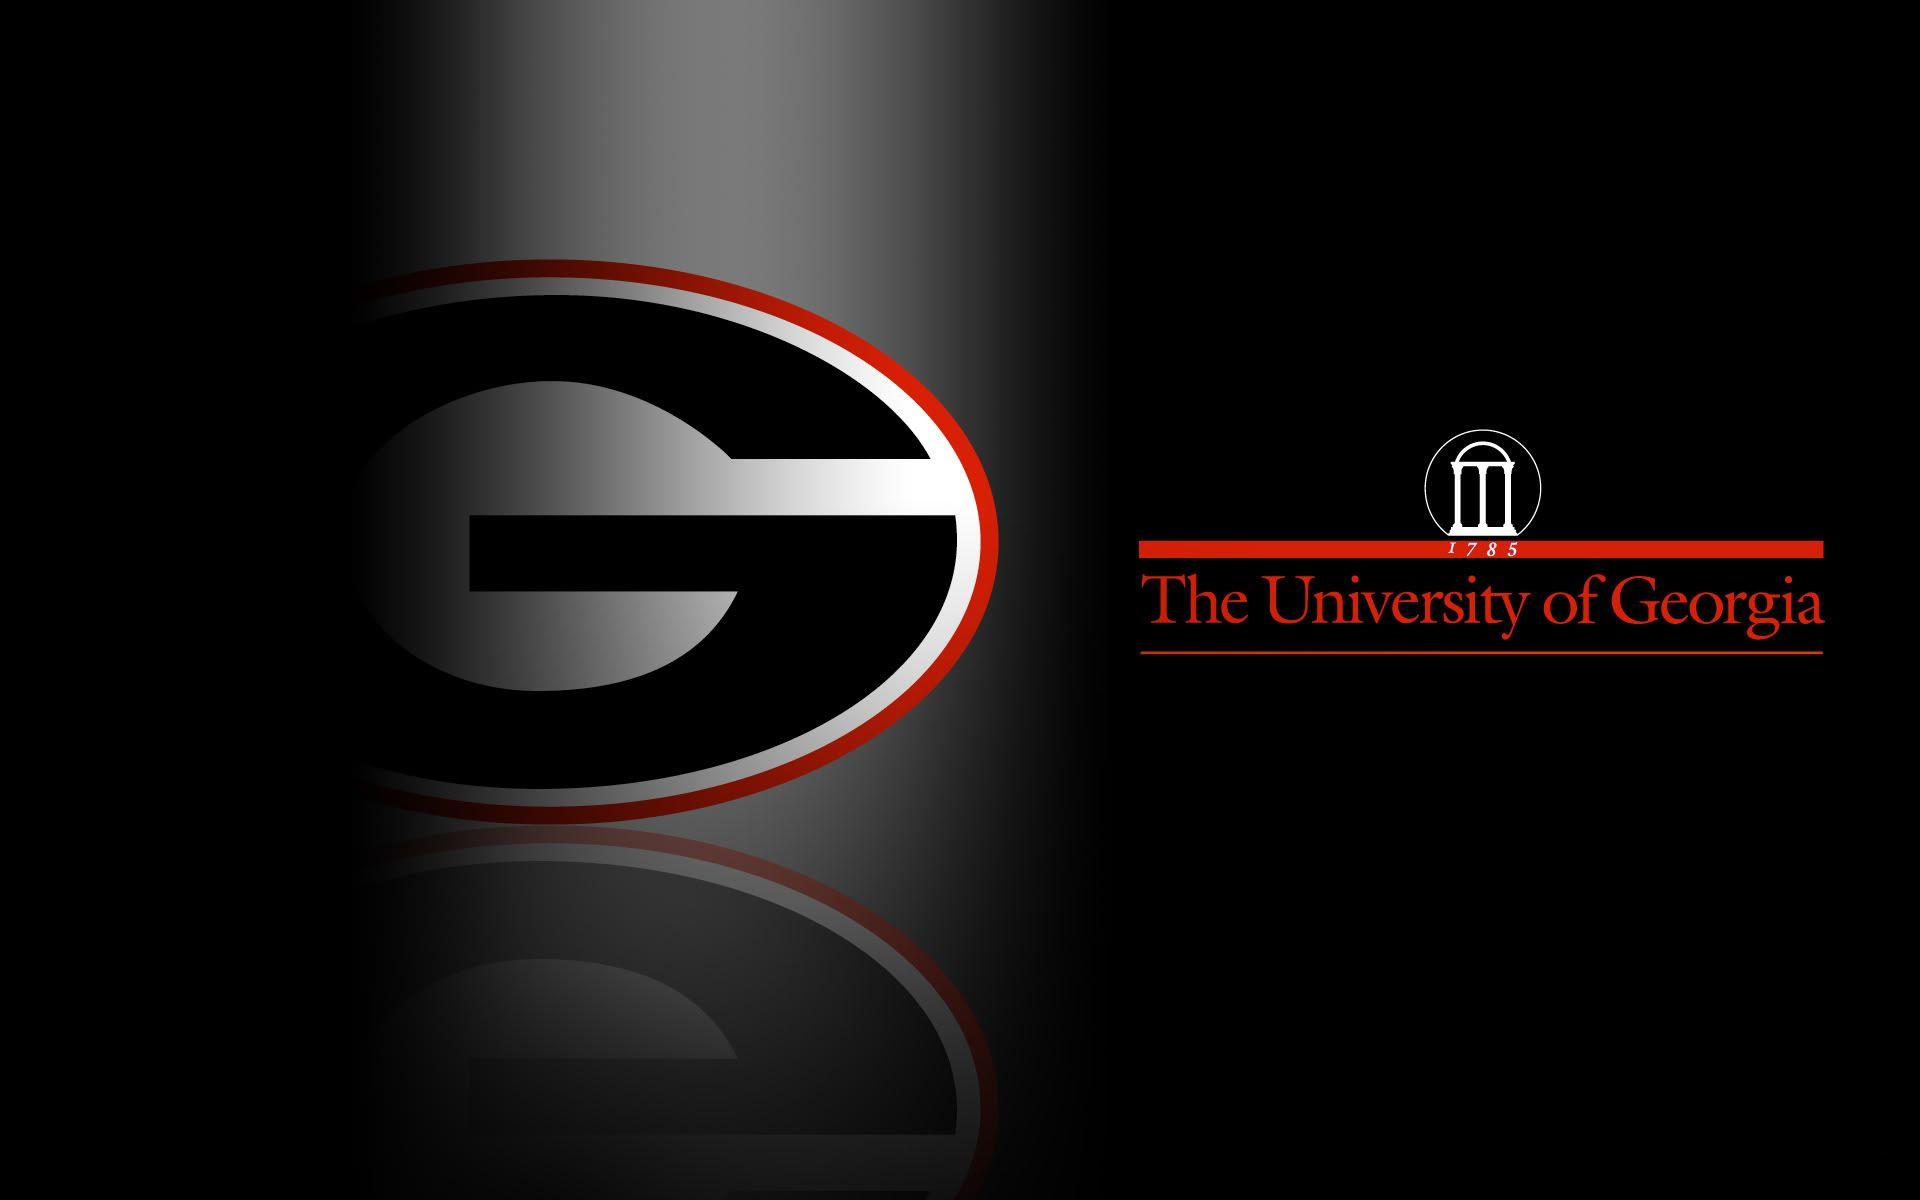 Georgia Bulldog Wallpapers Browser Themes More Georgia Bulldogs Football University Of Georgia Georgia Football